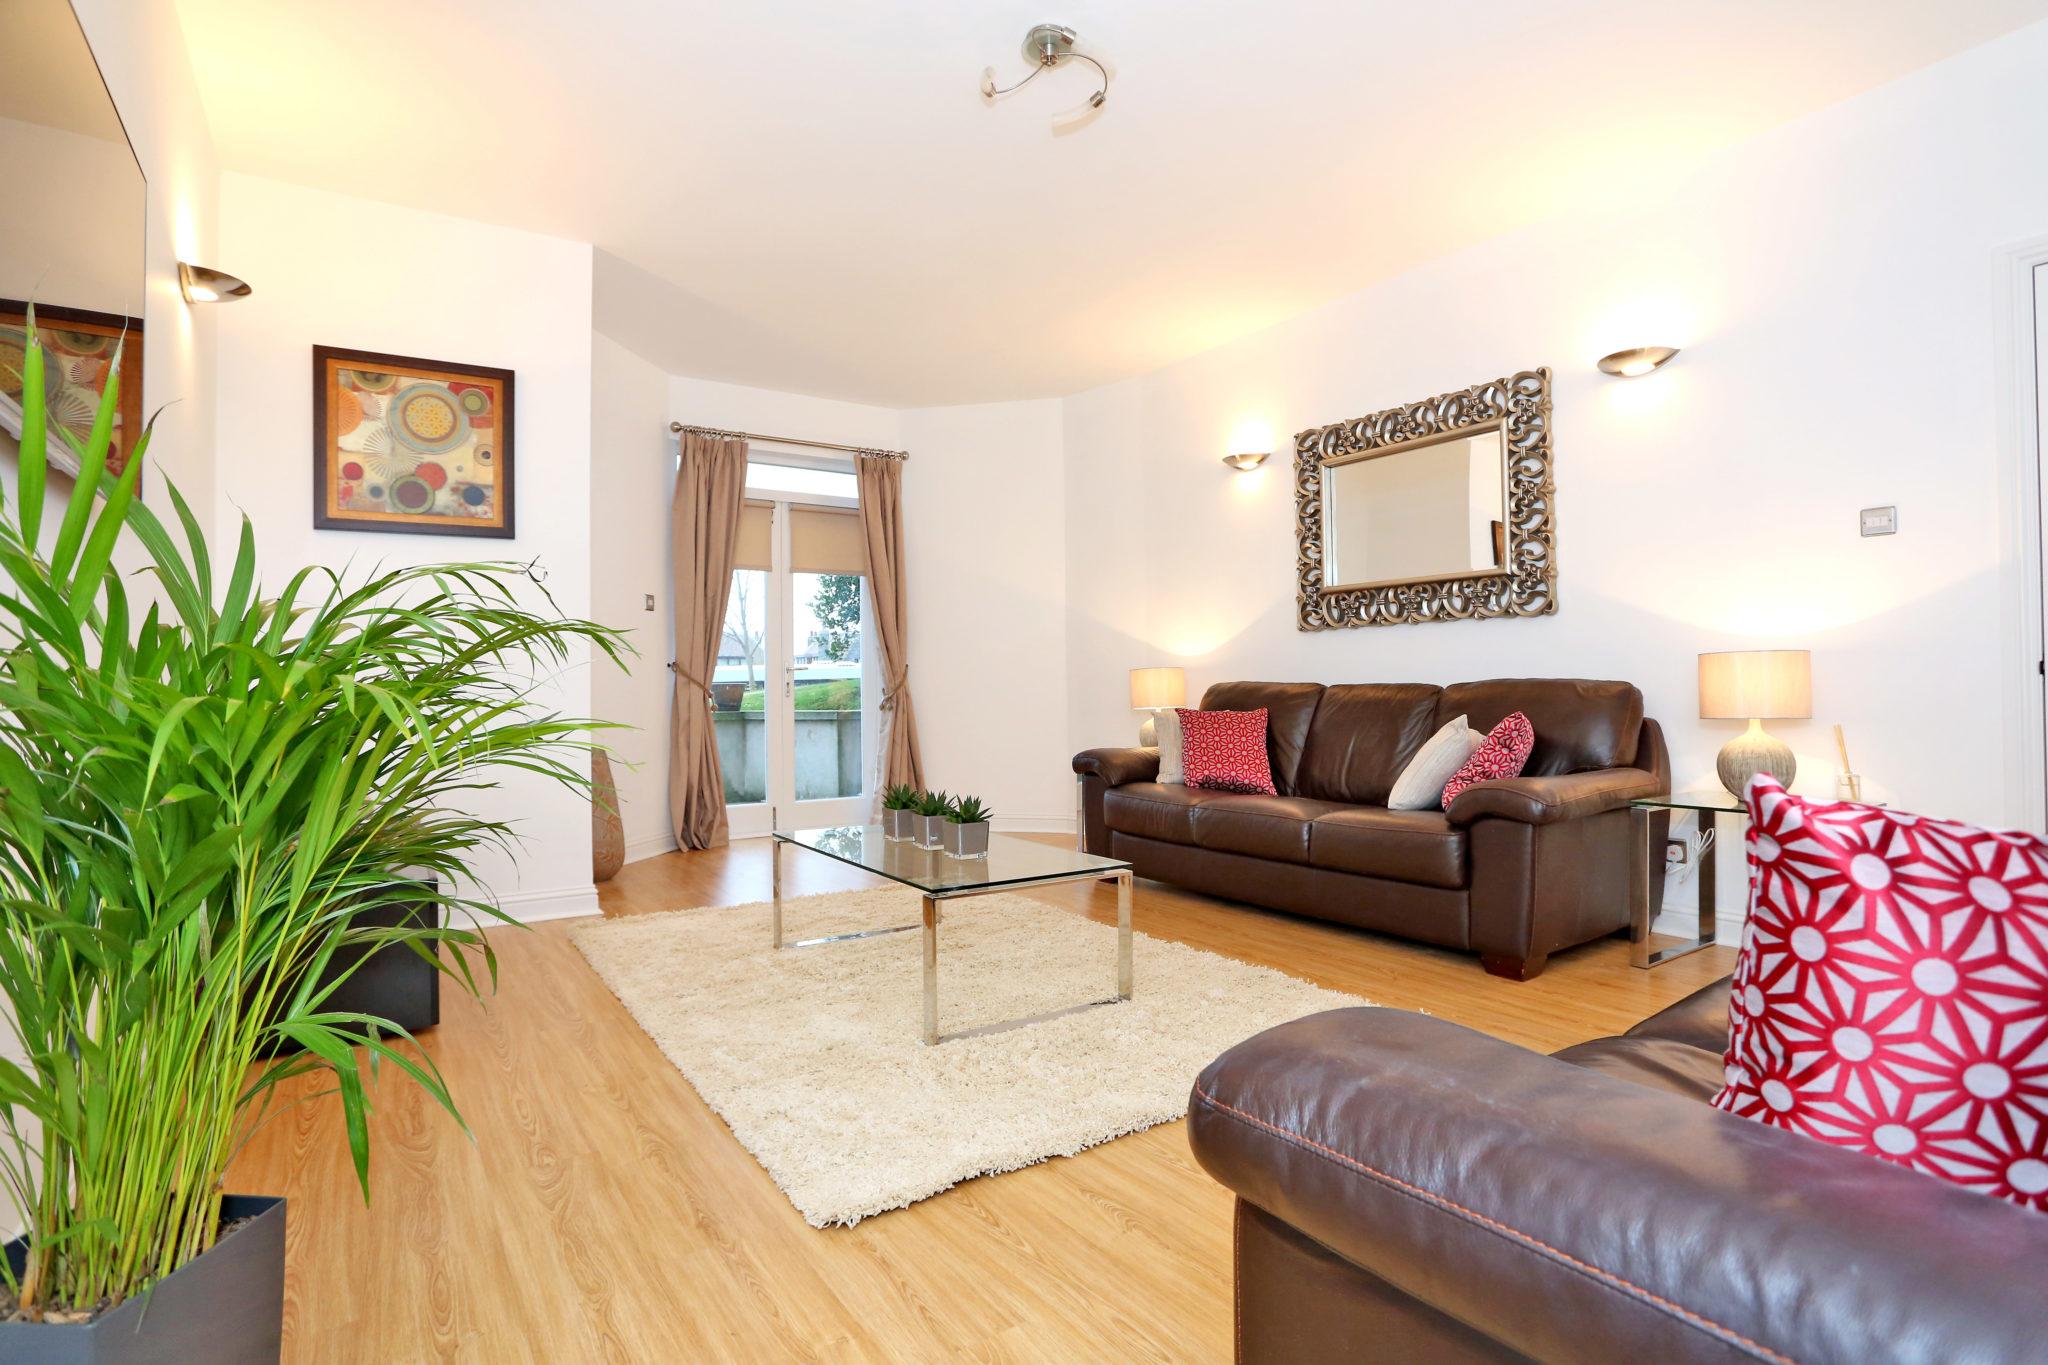 Cheap-Accommodation-Aberdeen---Queen's-Road-Apartments-Near-Hazelhead-Park---Urban-Stay-2